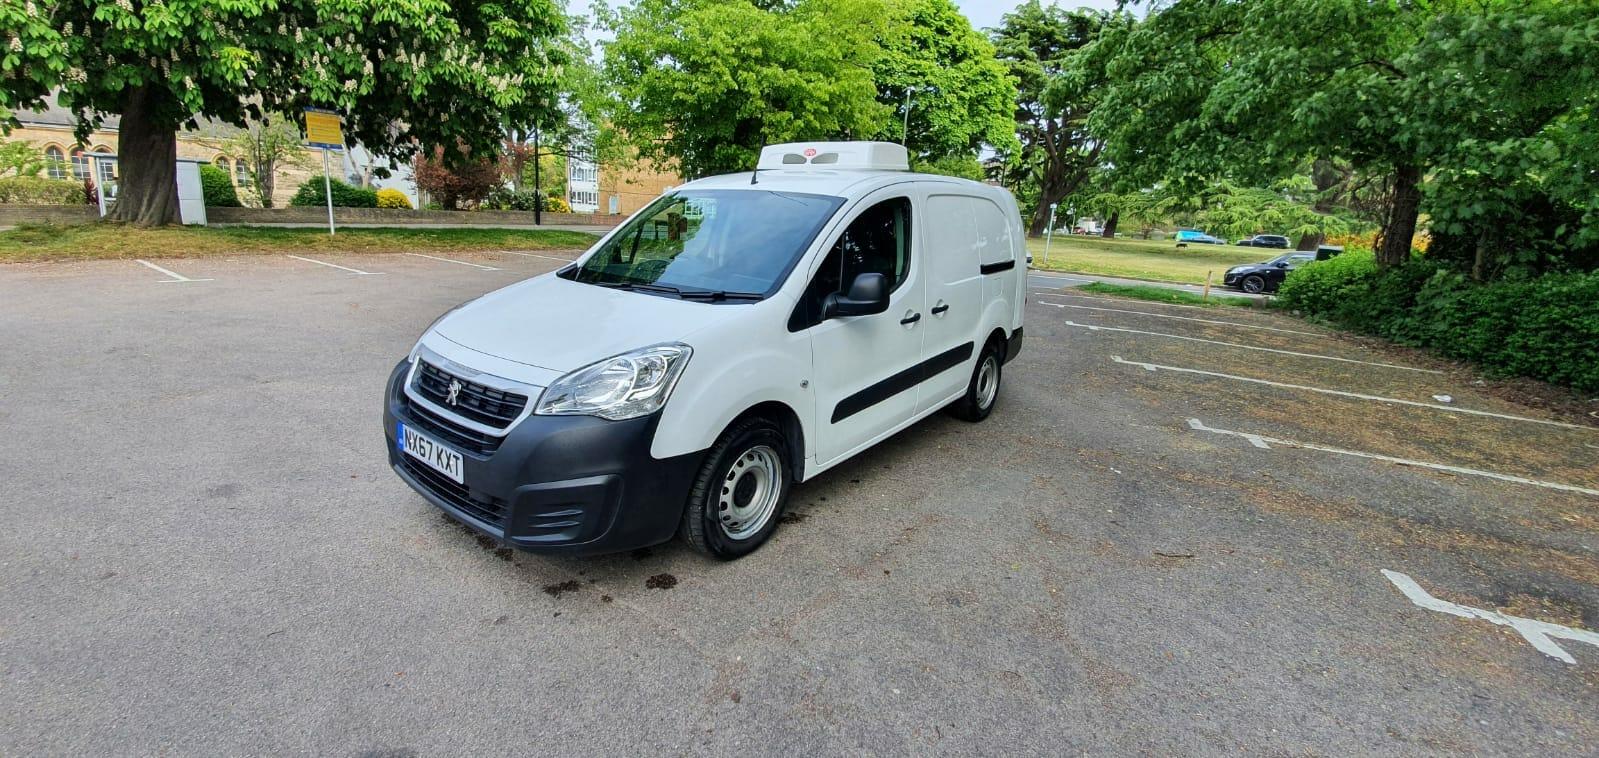 2017 Peugeot Partner 750 L2 H1 LWB Freezer Van For Sale